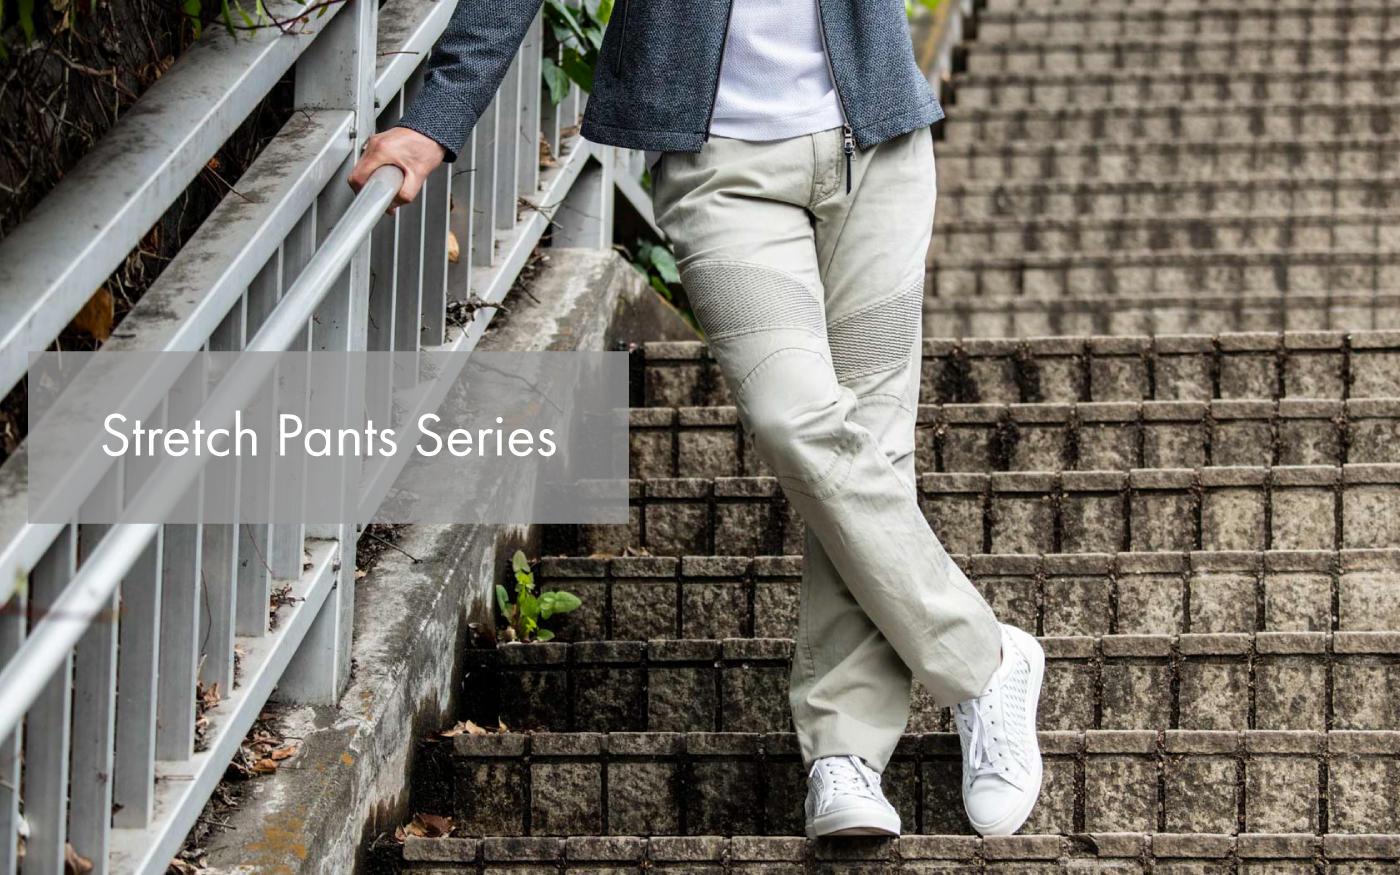 Stretch Pants Series